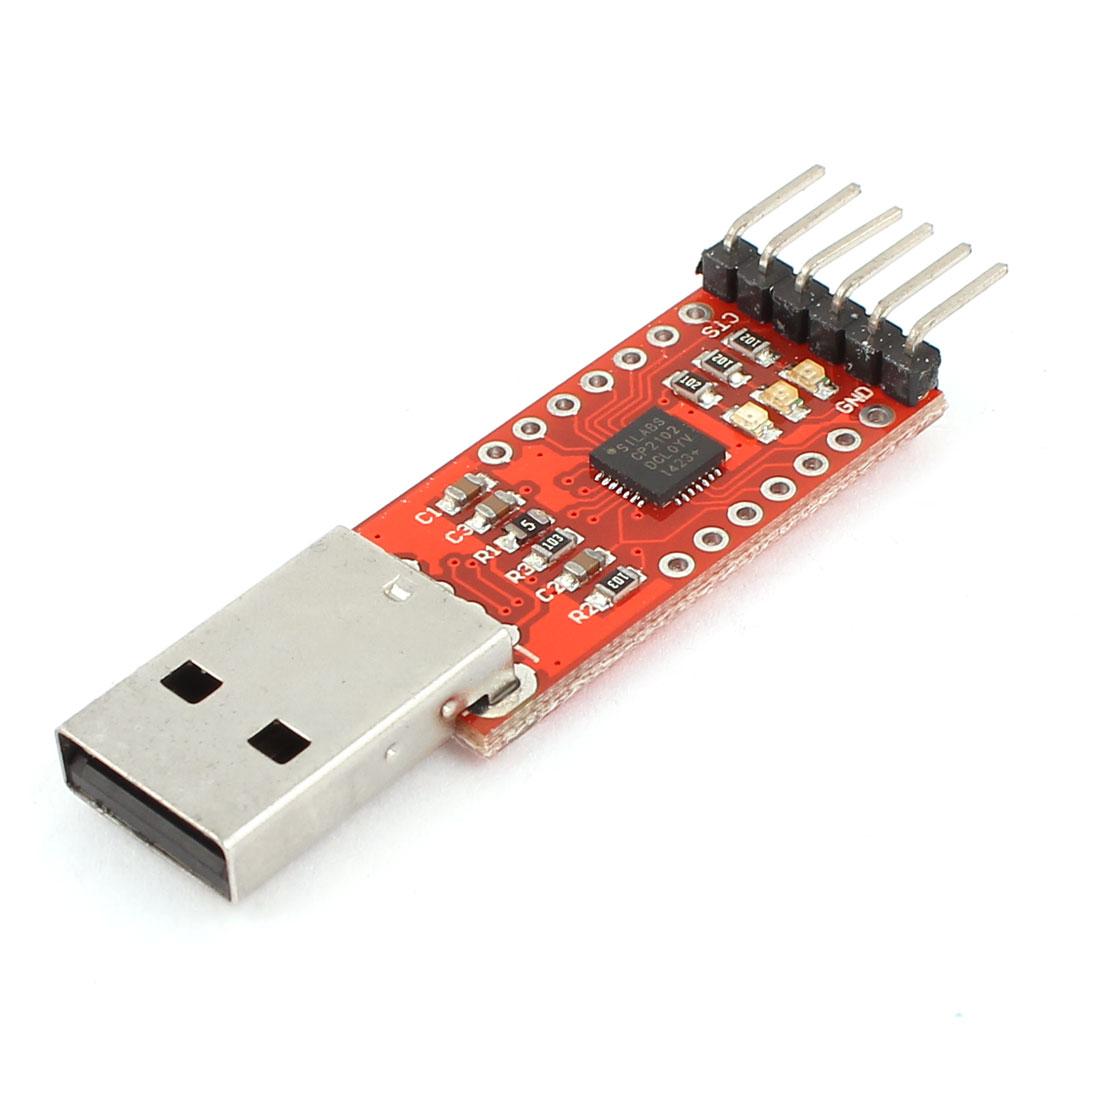 3.3V-5V Electronic USB 2.0 to TTL Converter 6 Pins Module